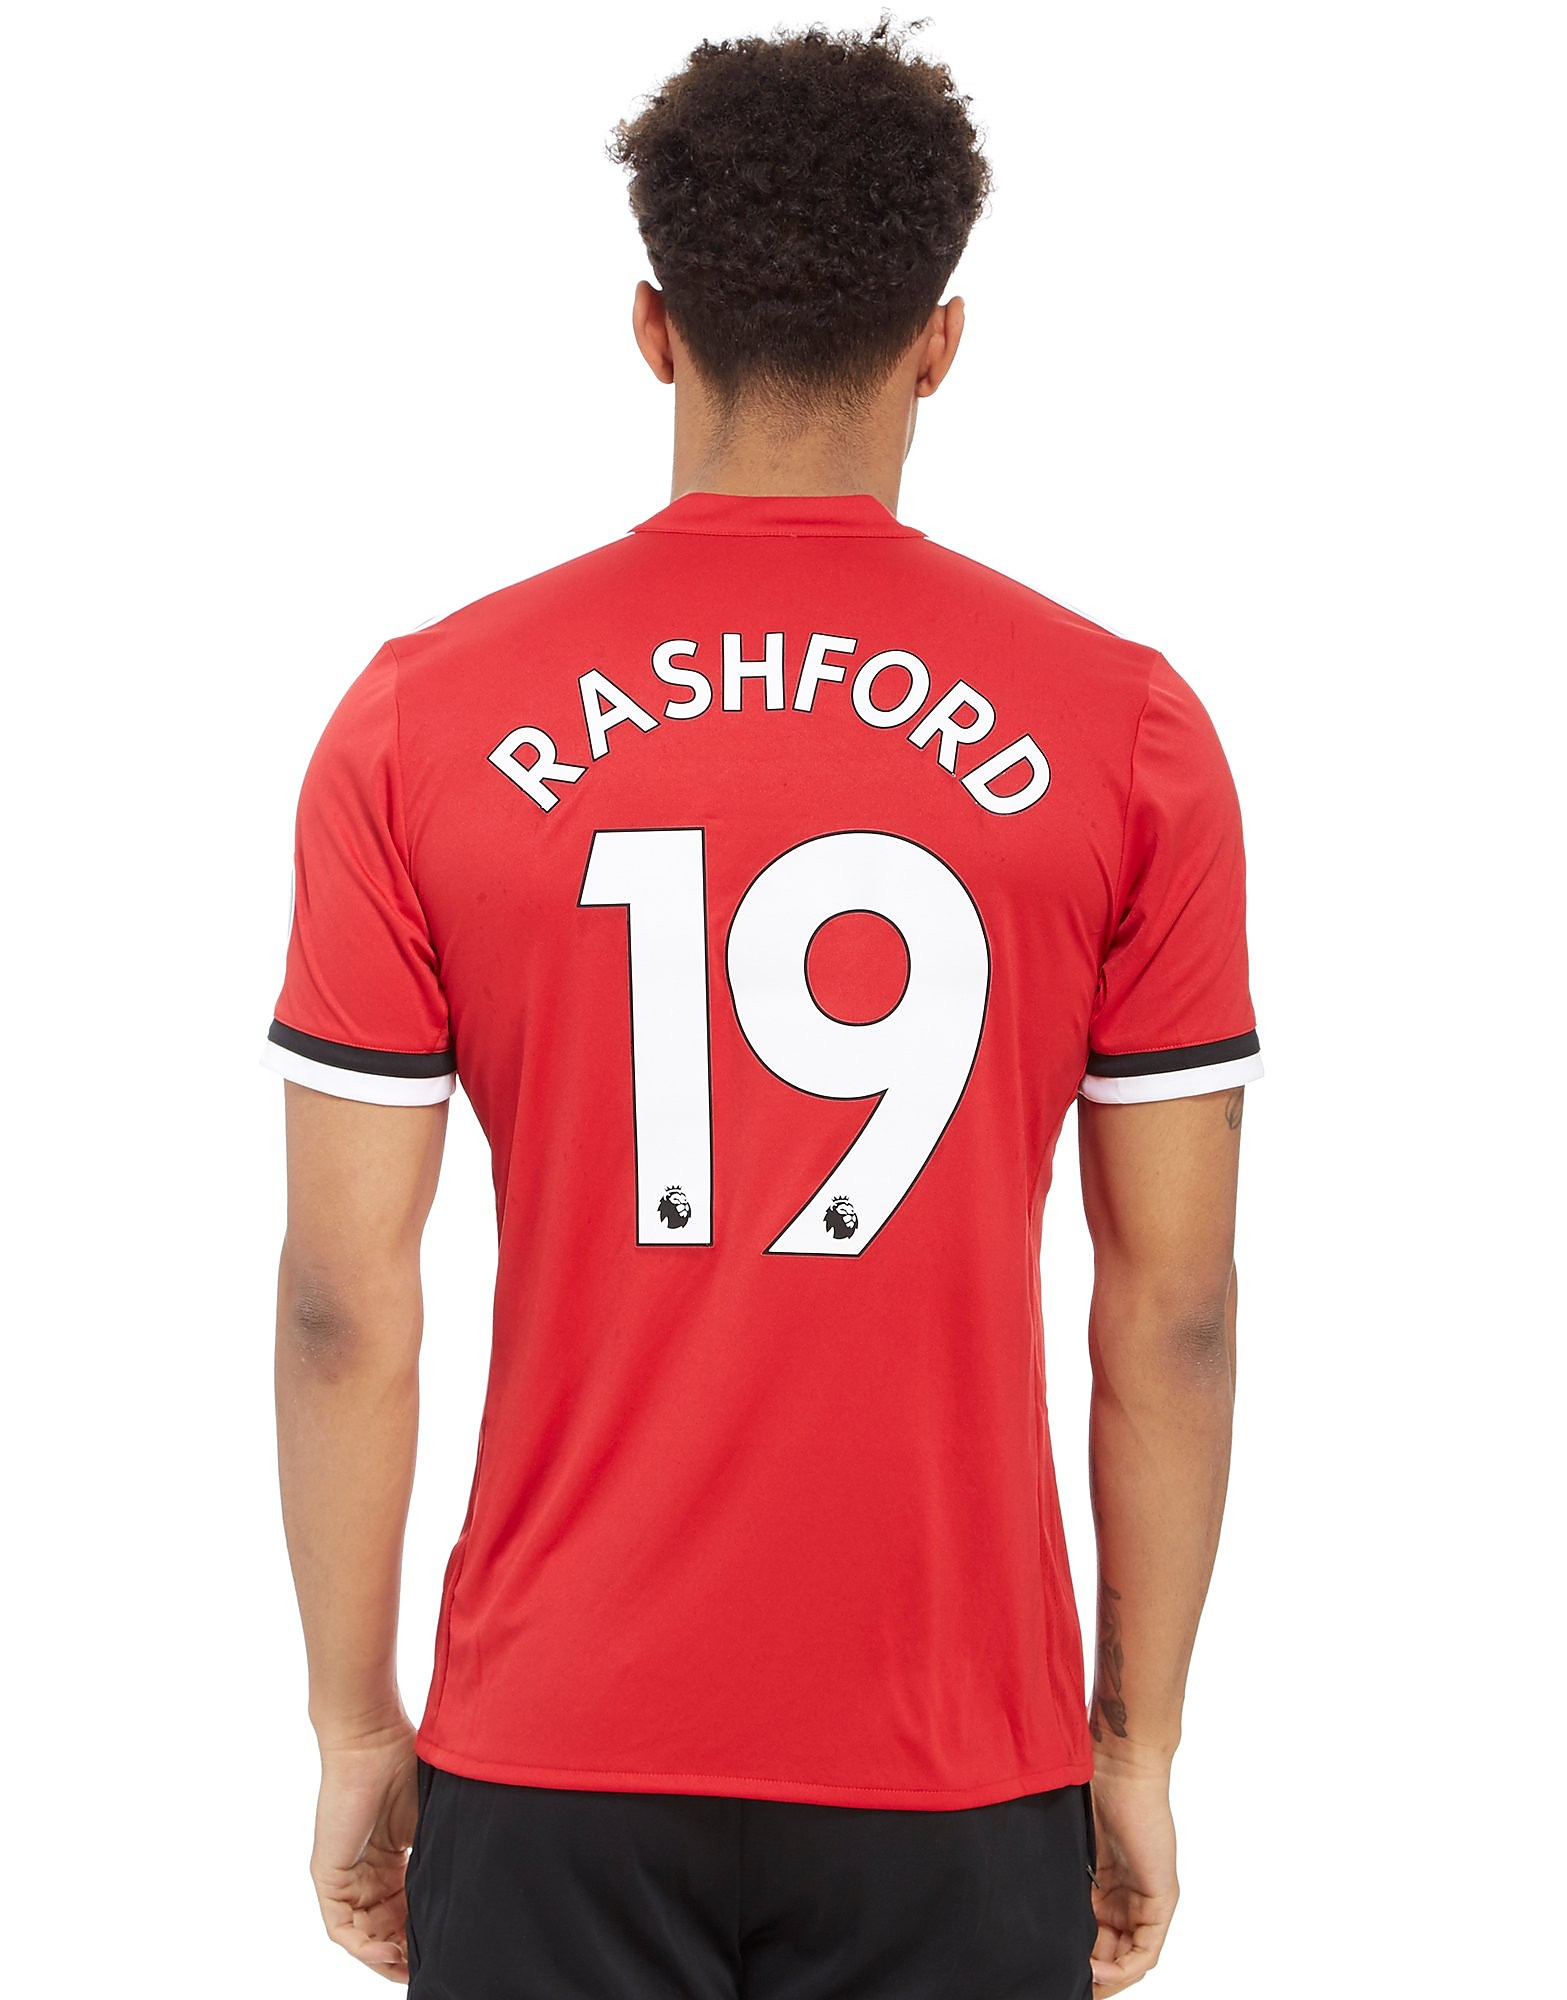 adidas Manchester United Rashford 2017/18 Home Shirt